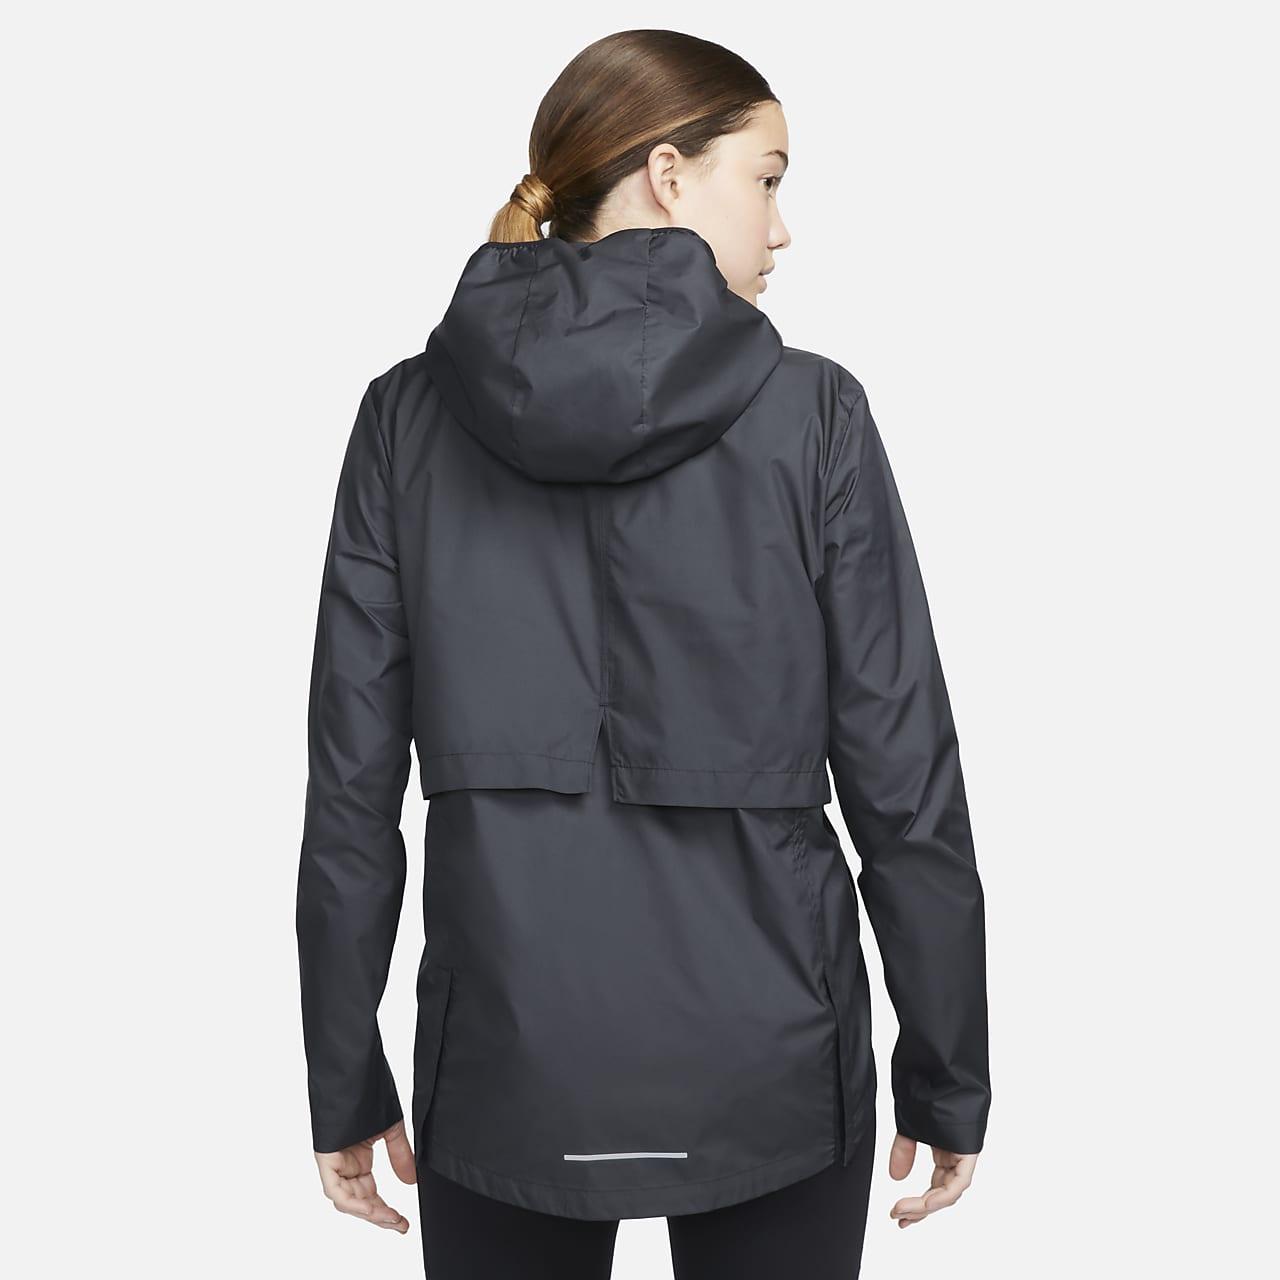 40fd9edafd25 Nike Essential Women s Packable Running Rain Jacket. Nike.com PT